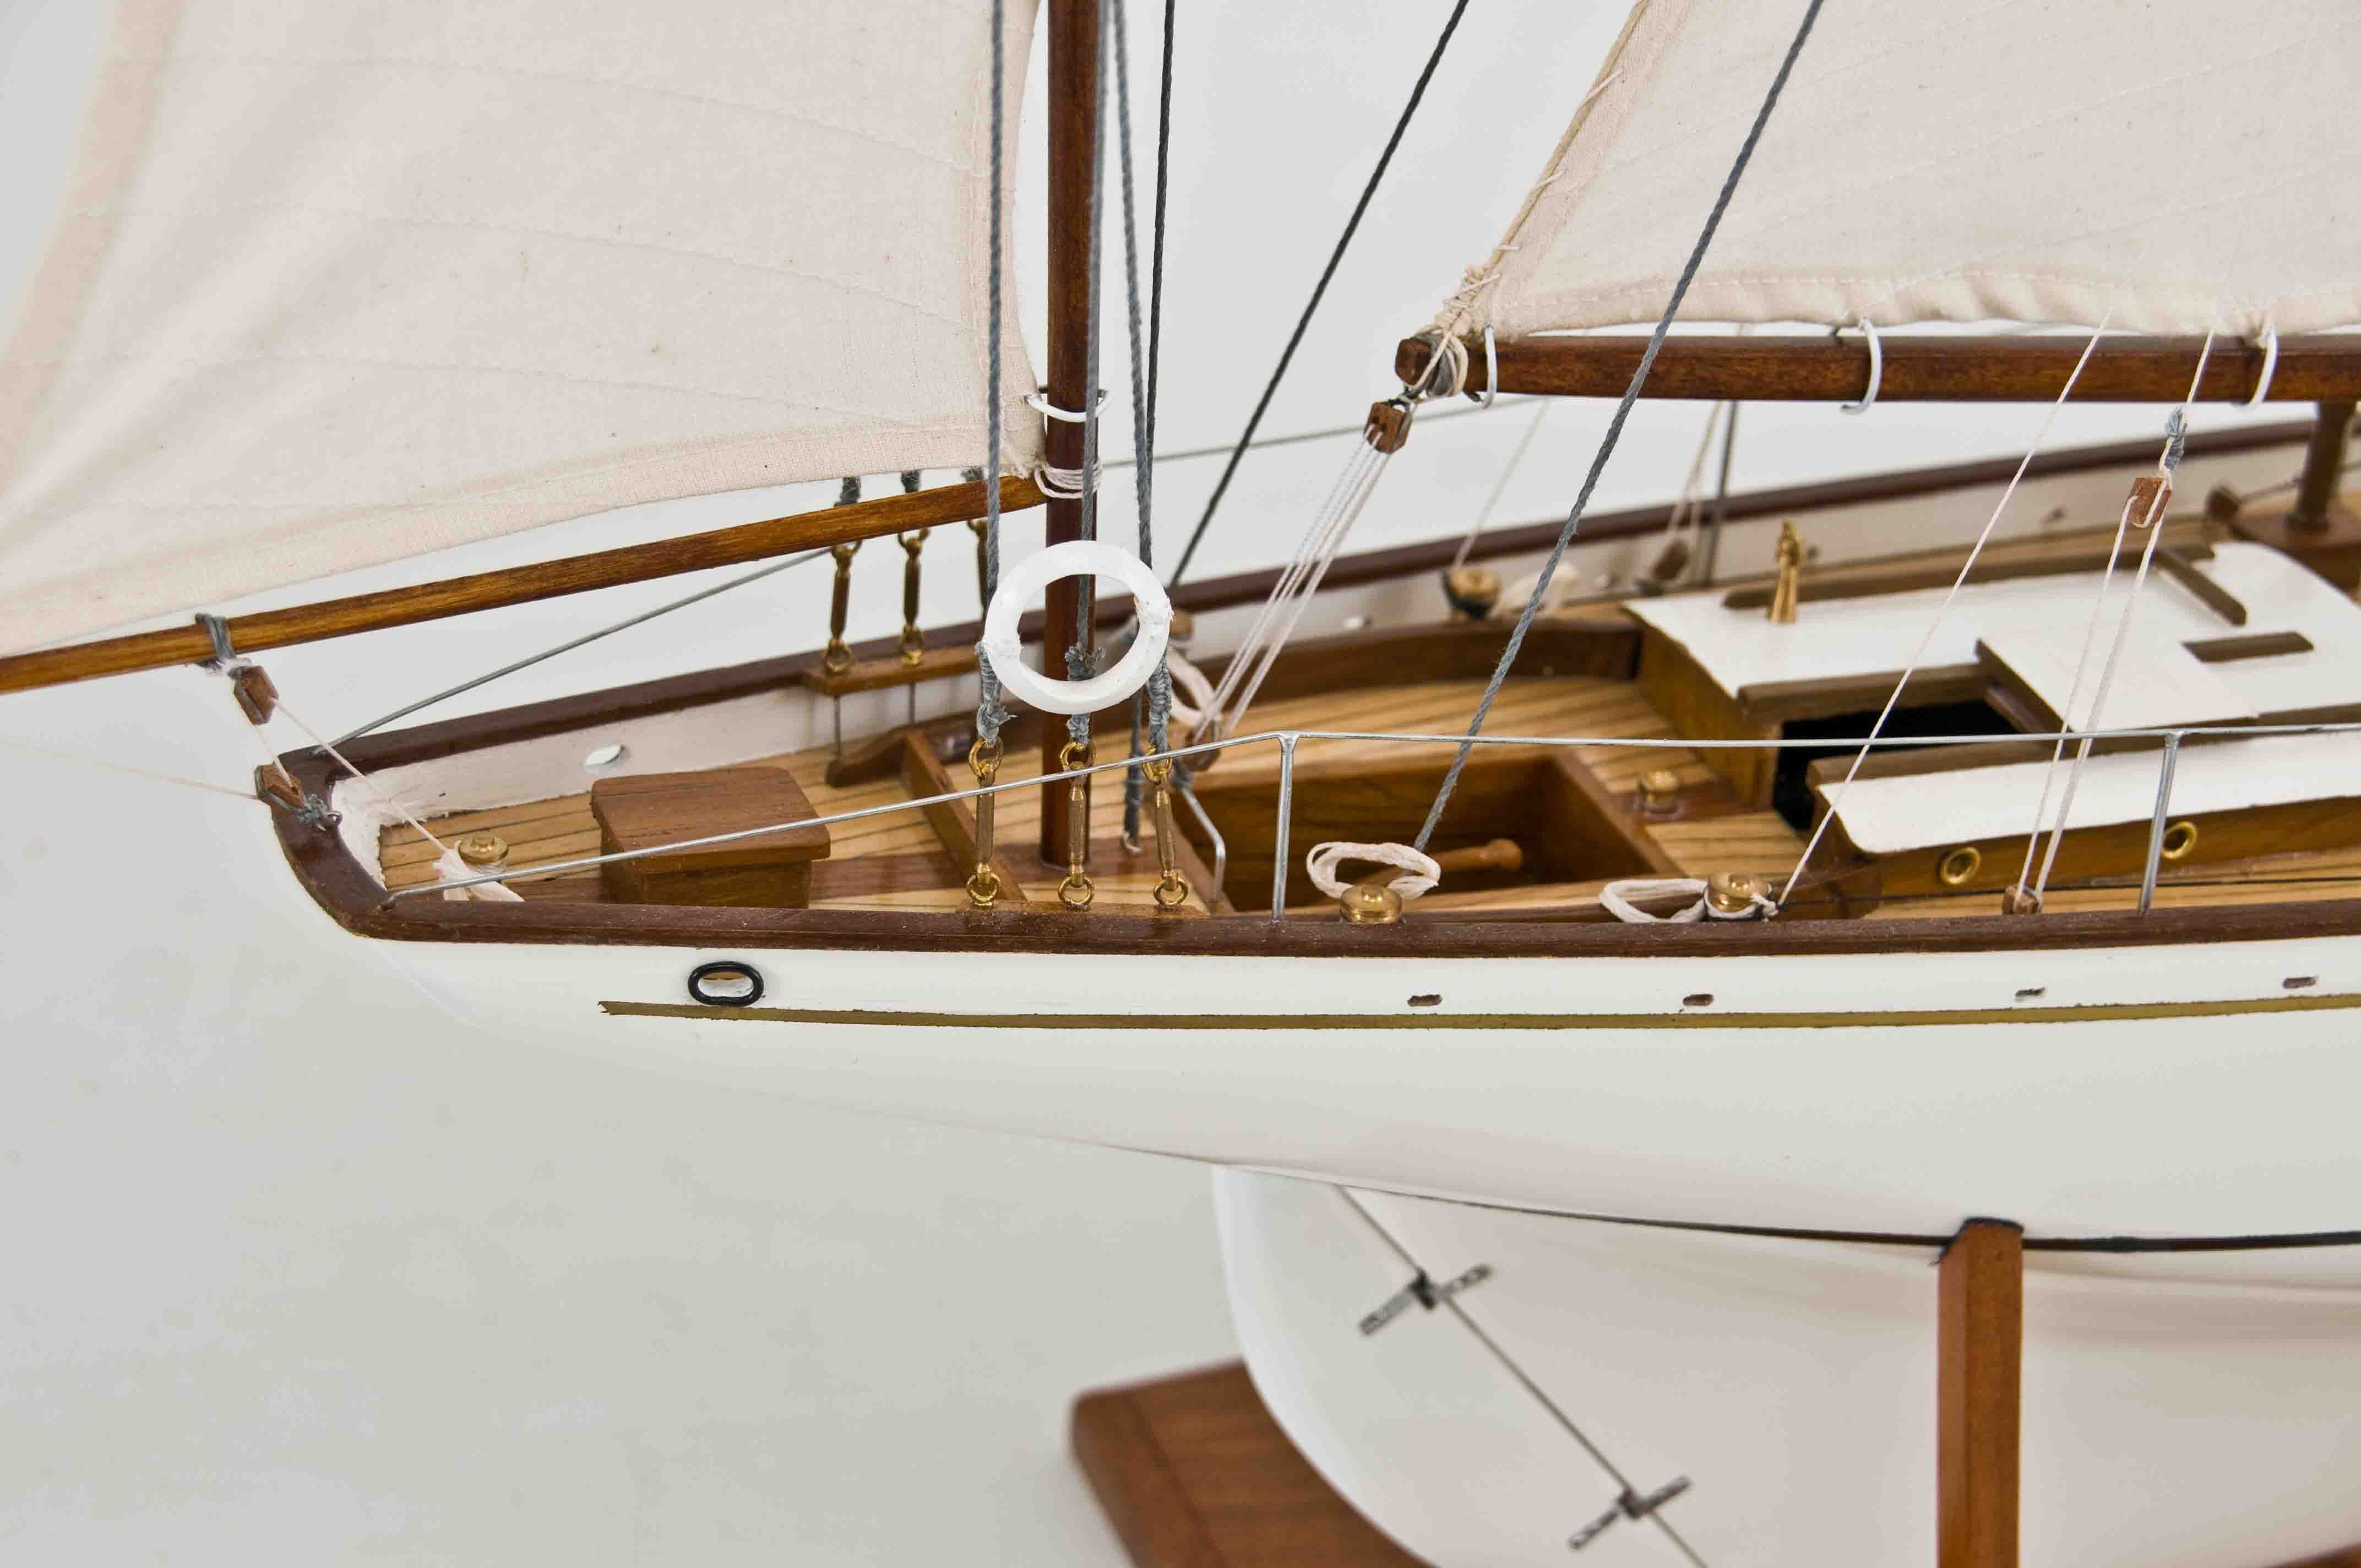 2539-14430-Dorade-Model-Yacht-Superior-Range